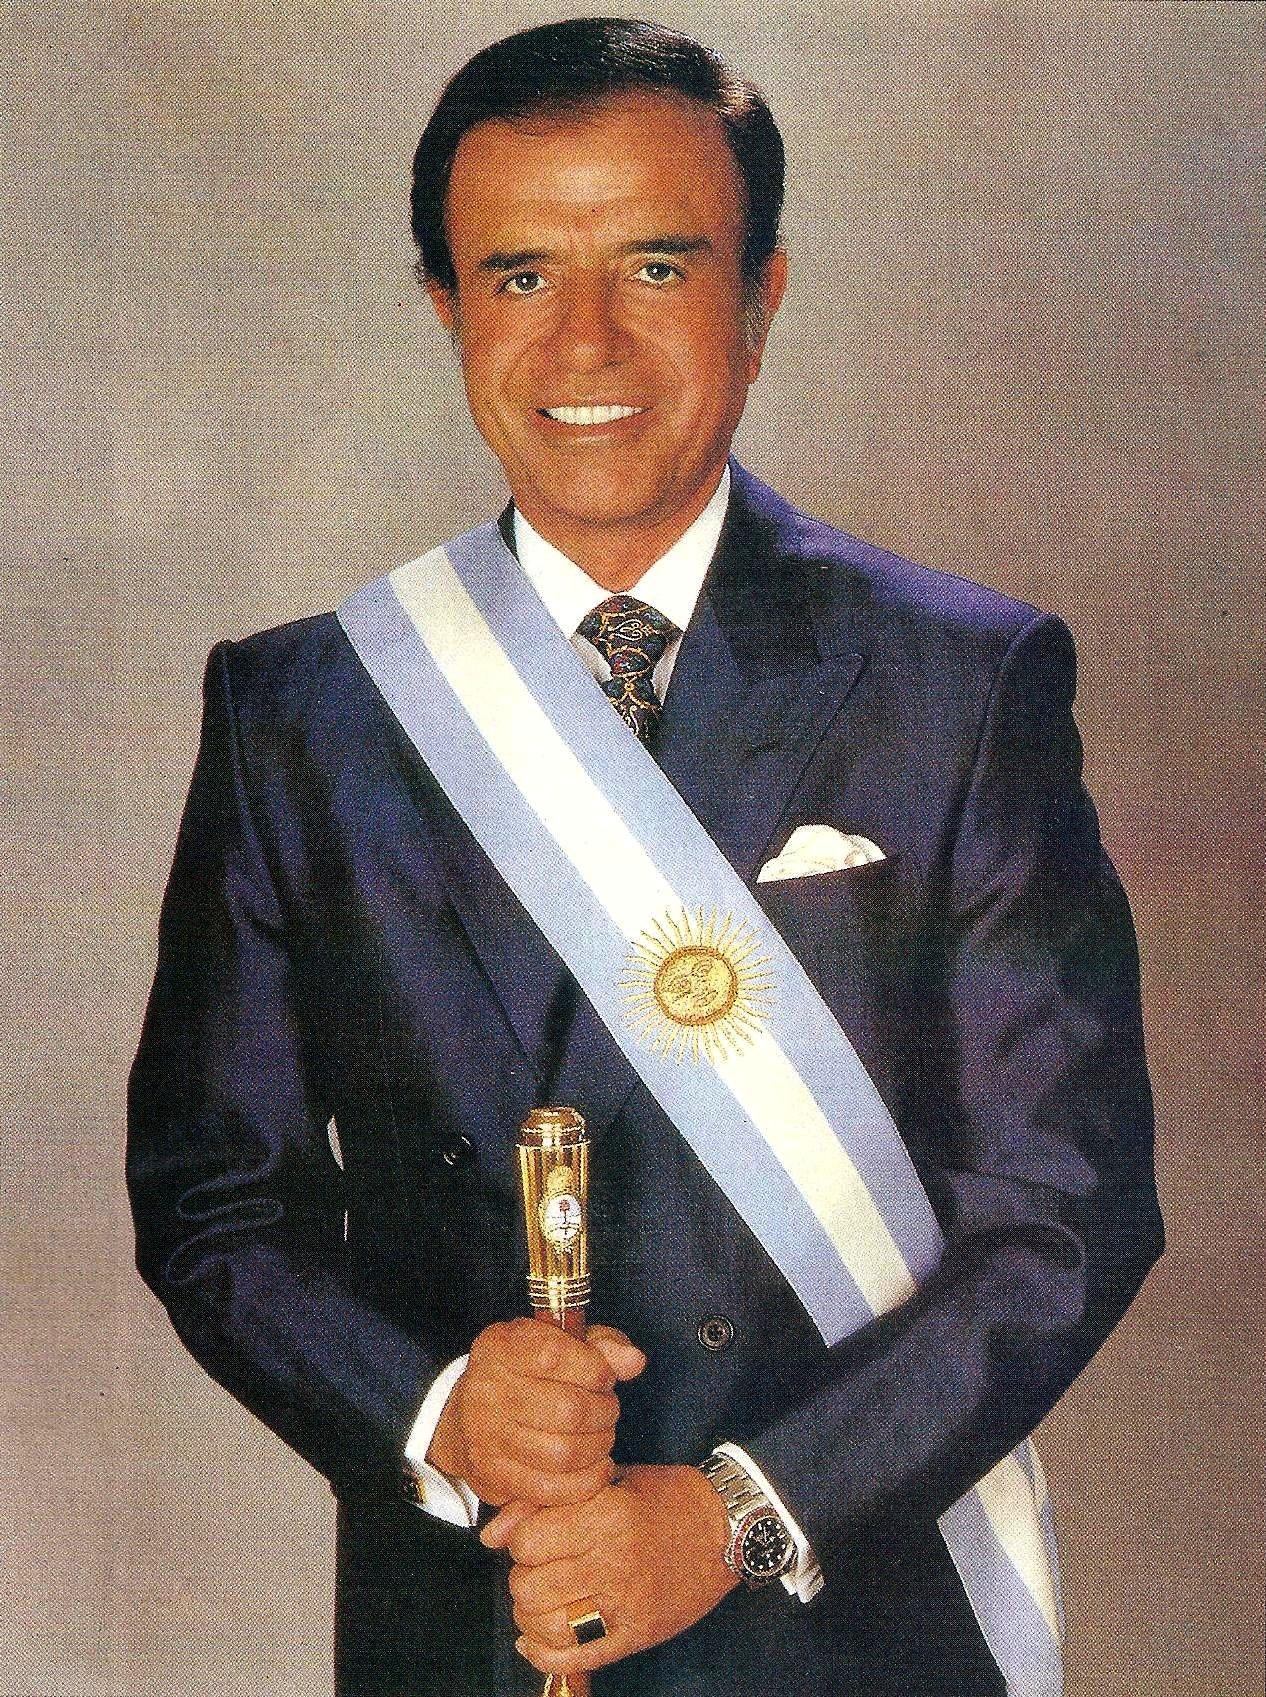 Te presento mi país: Argentina